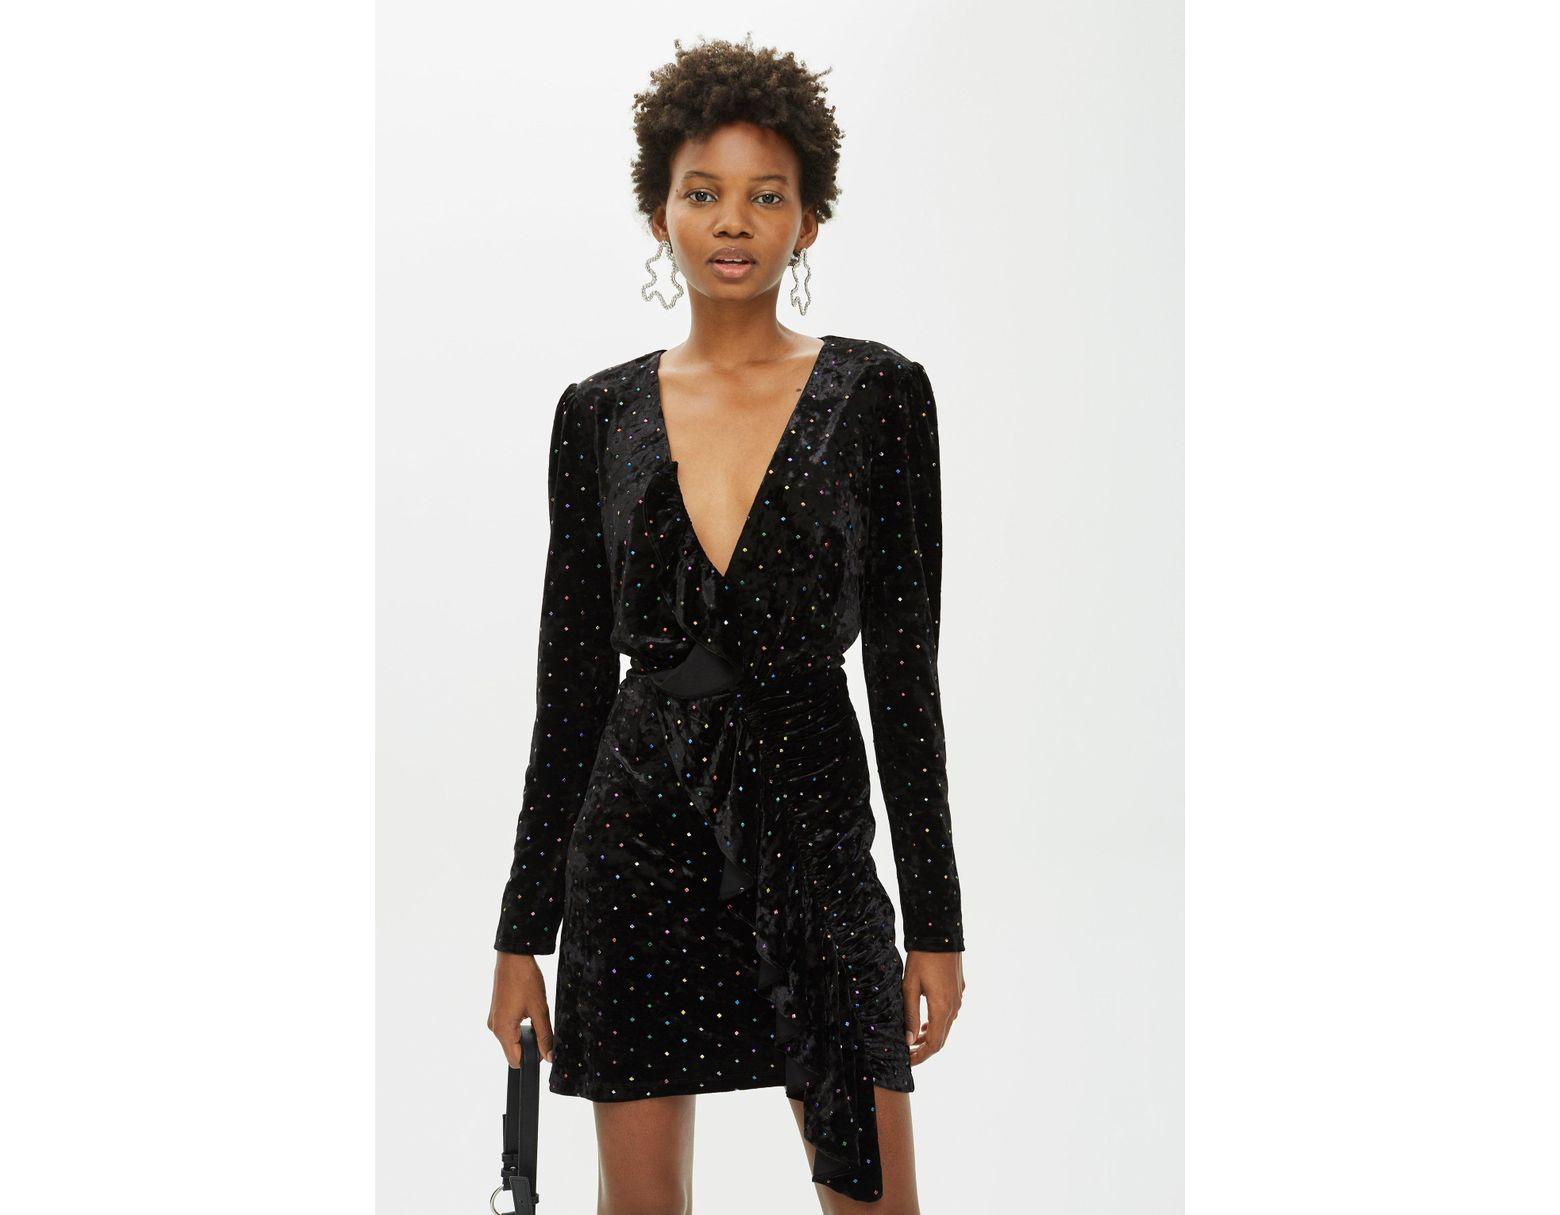 83e5a21a64cd TOPSHOP Stud Velvet Frill Dress in Black - Save 88% - Lyst